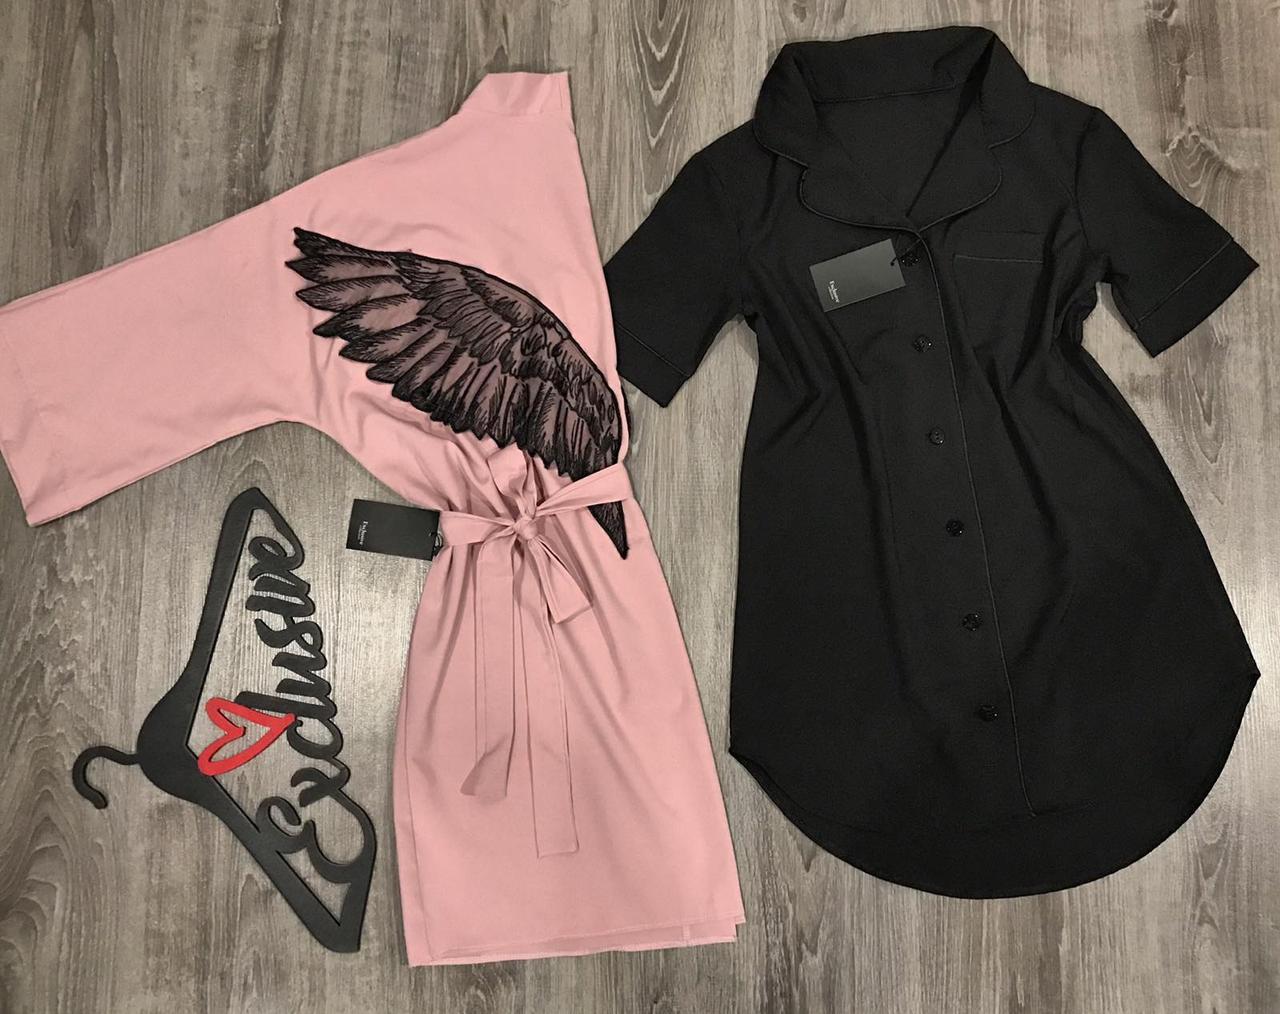 Халат-кімоно крила ангела+сорочка-сукня, комплект 043+014.